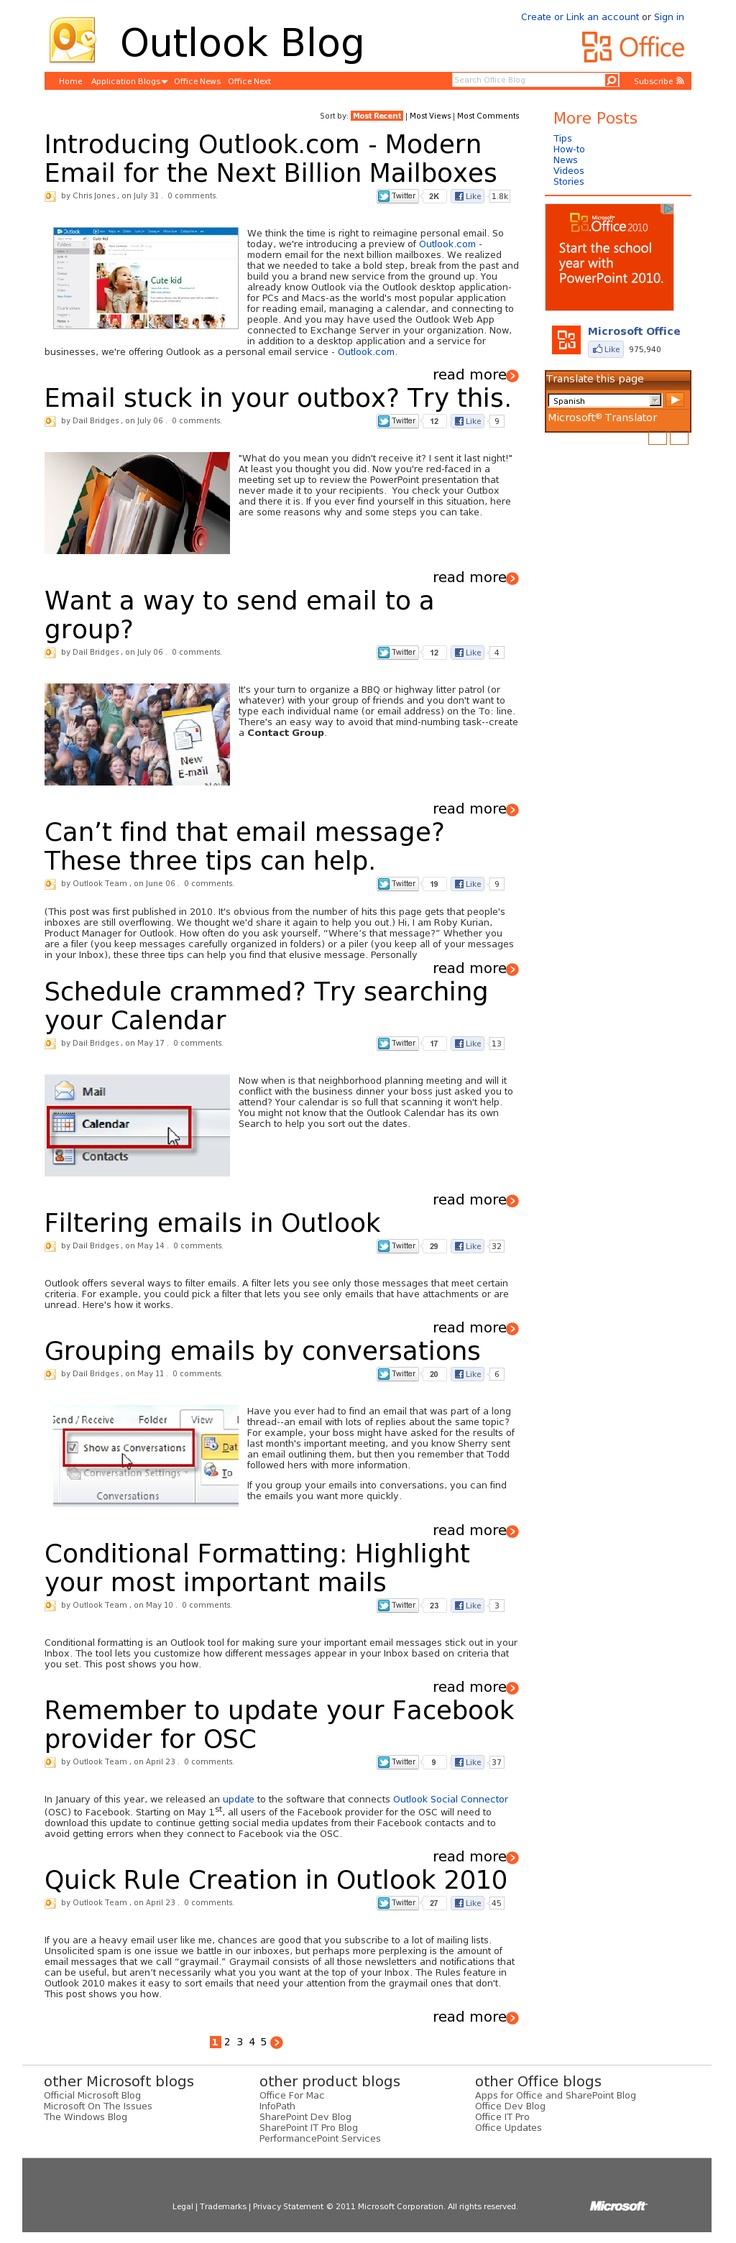 Outlook Blog  Microsoft  08.2012